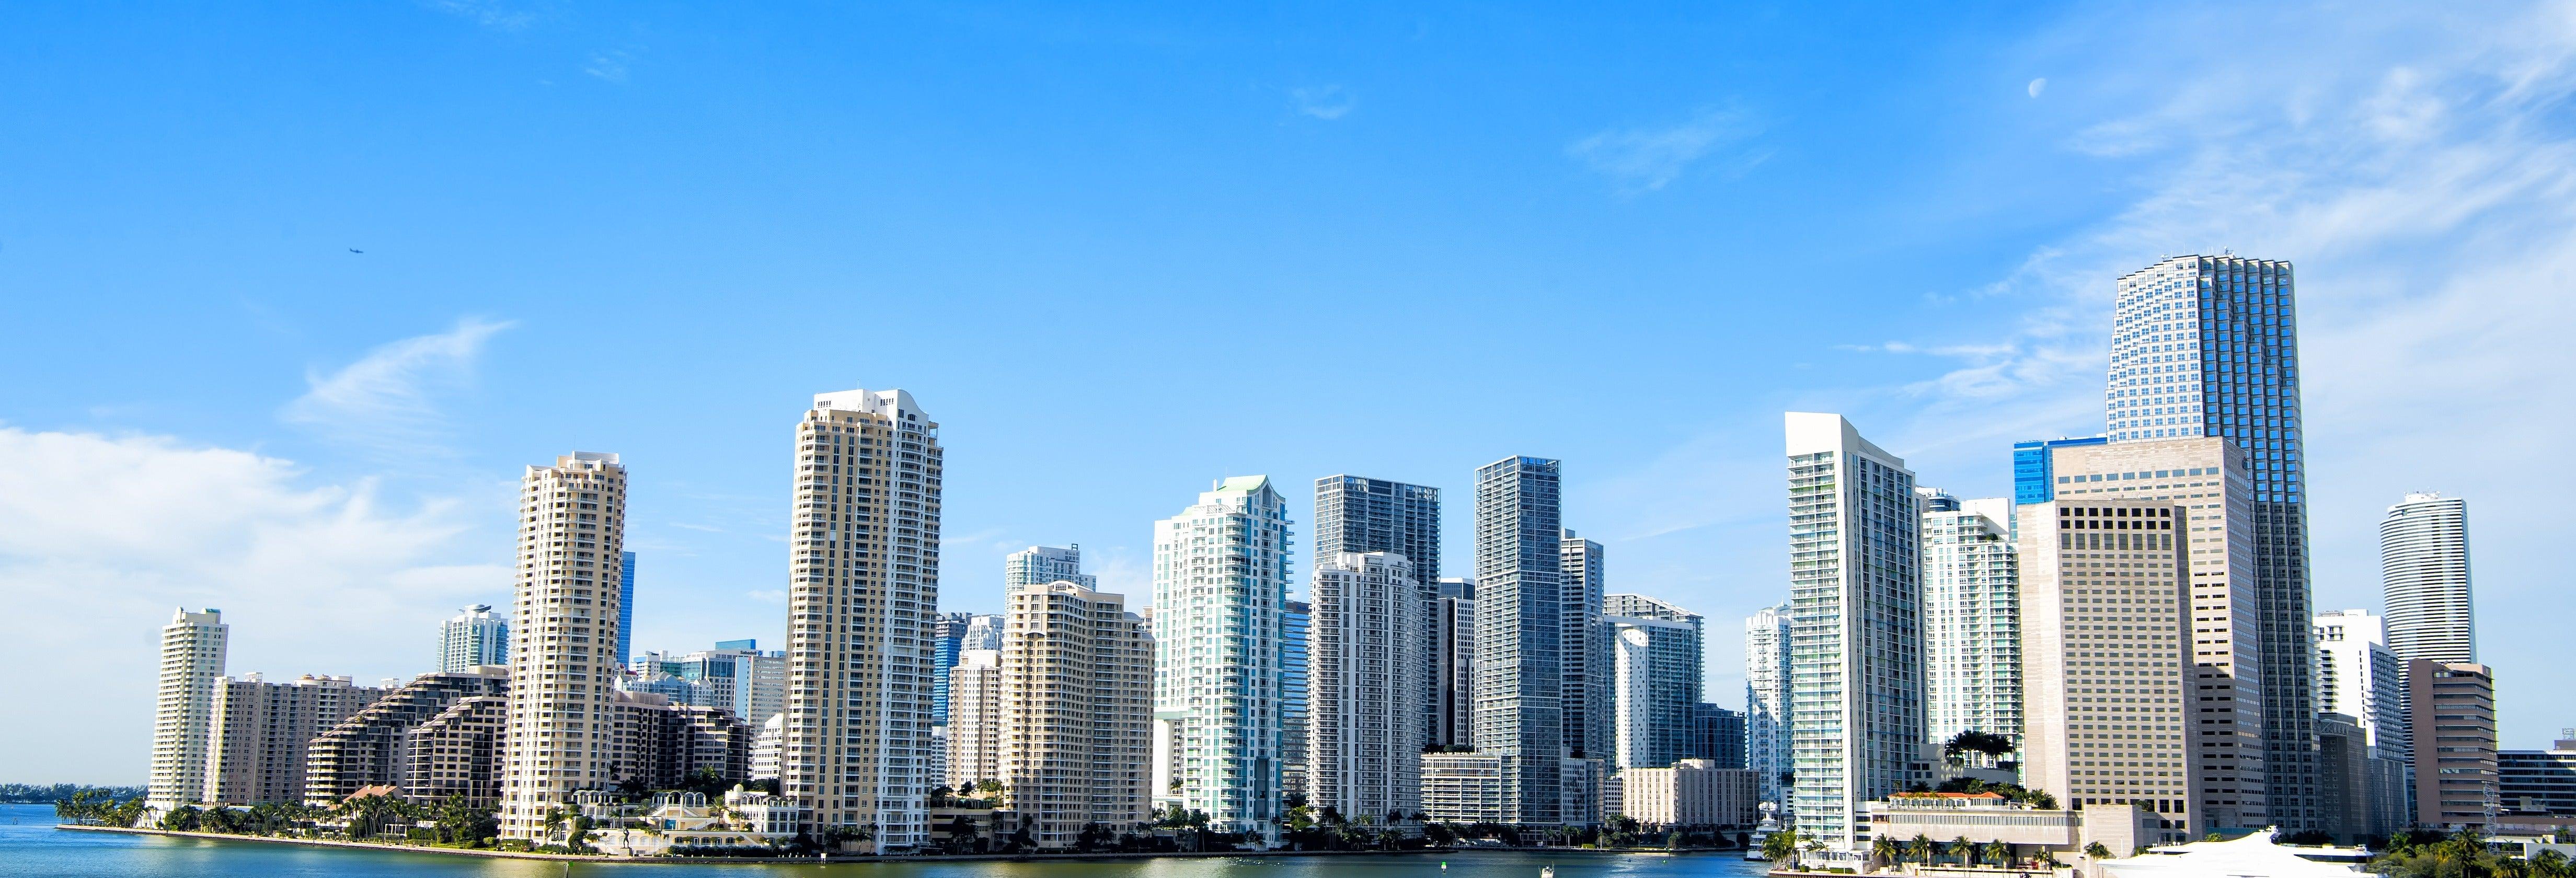 Miami Combo: City Tour + Everglades + Celebrity Homes